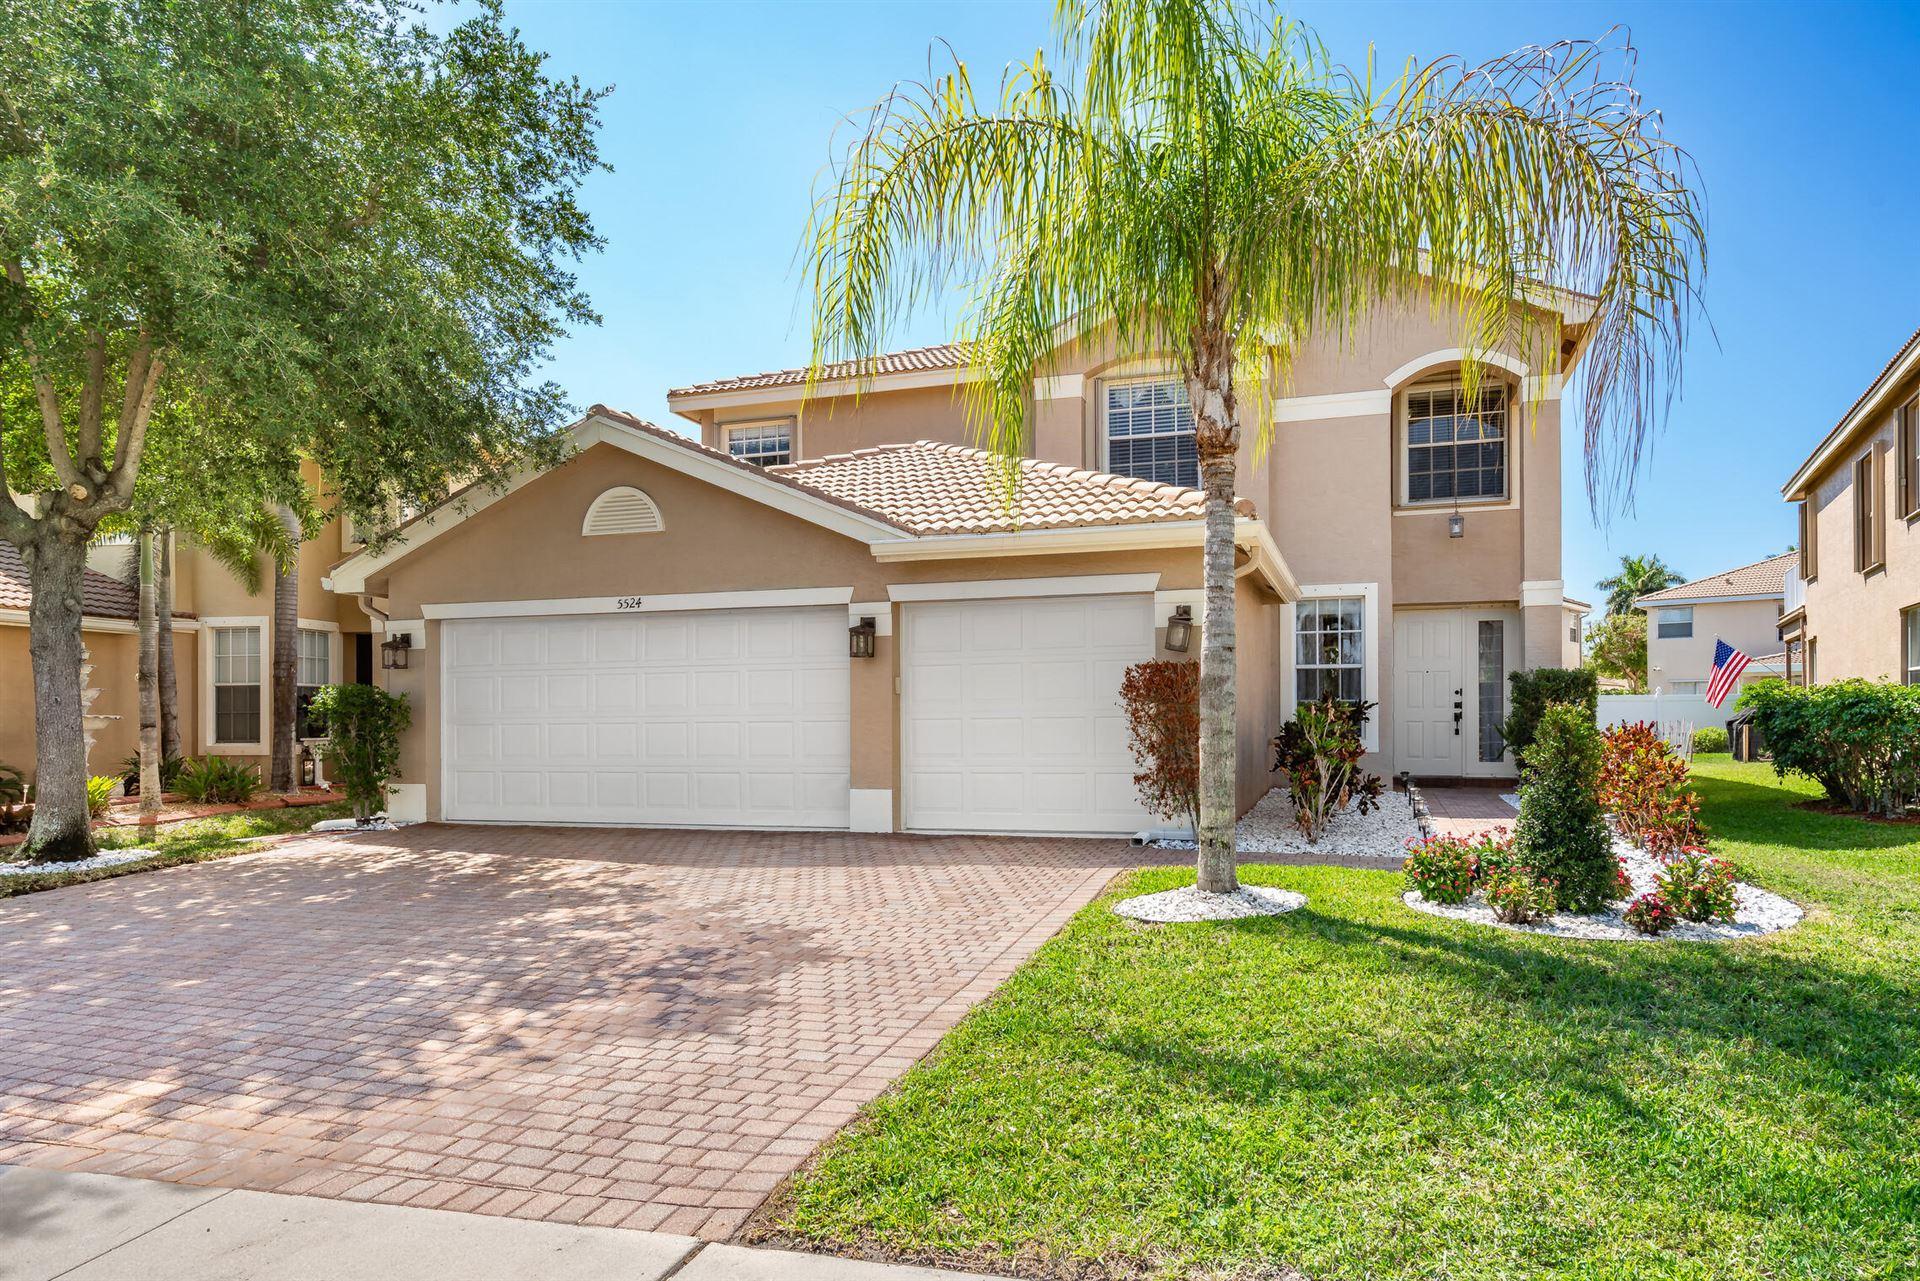 5524 Albin Drive, Greenacres, FL 33463 - MLS#: RX-10713112